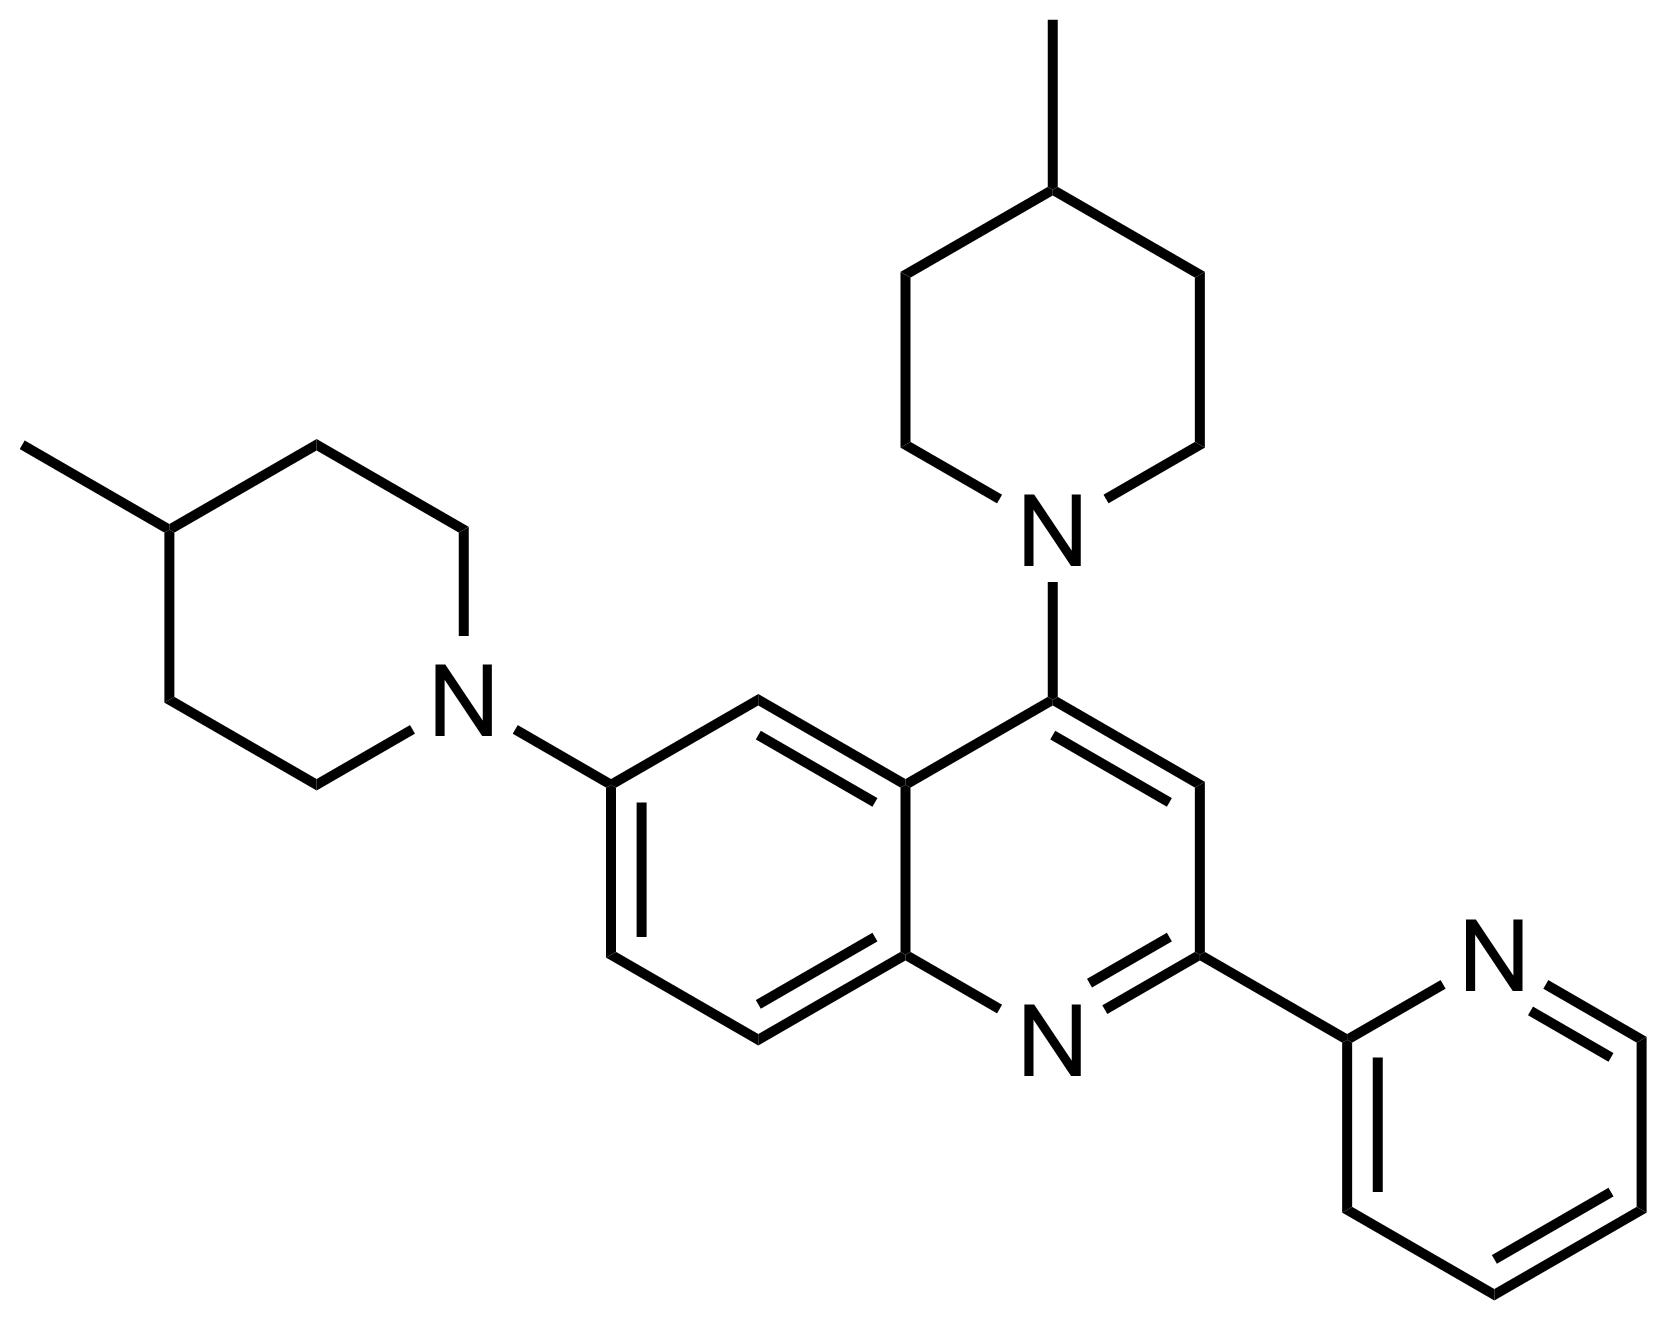 Structure of 4,6-Bis(4-methylpiperidin-1-yl)-2-(pyridin-2-yl)quinoline